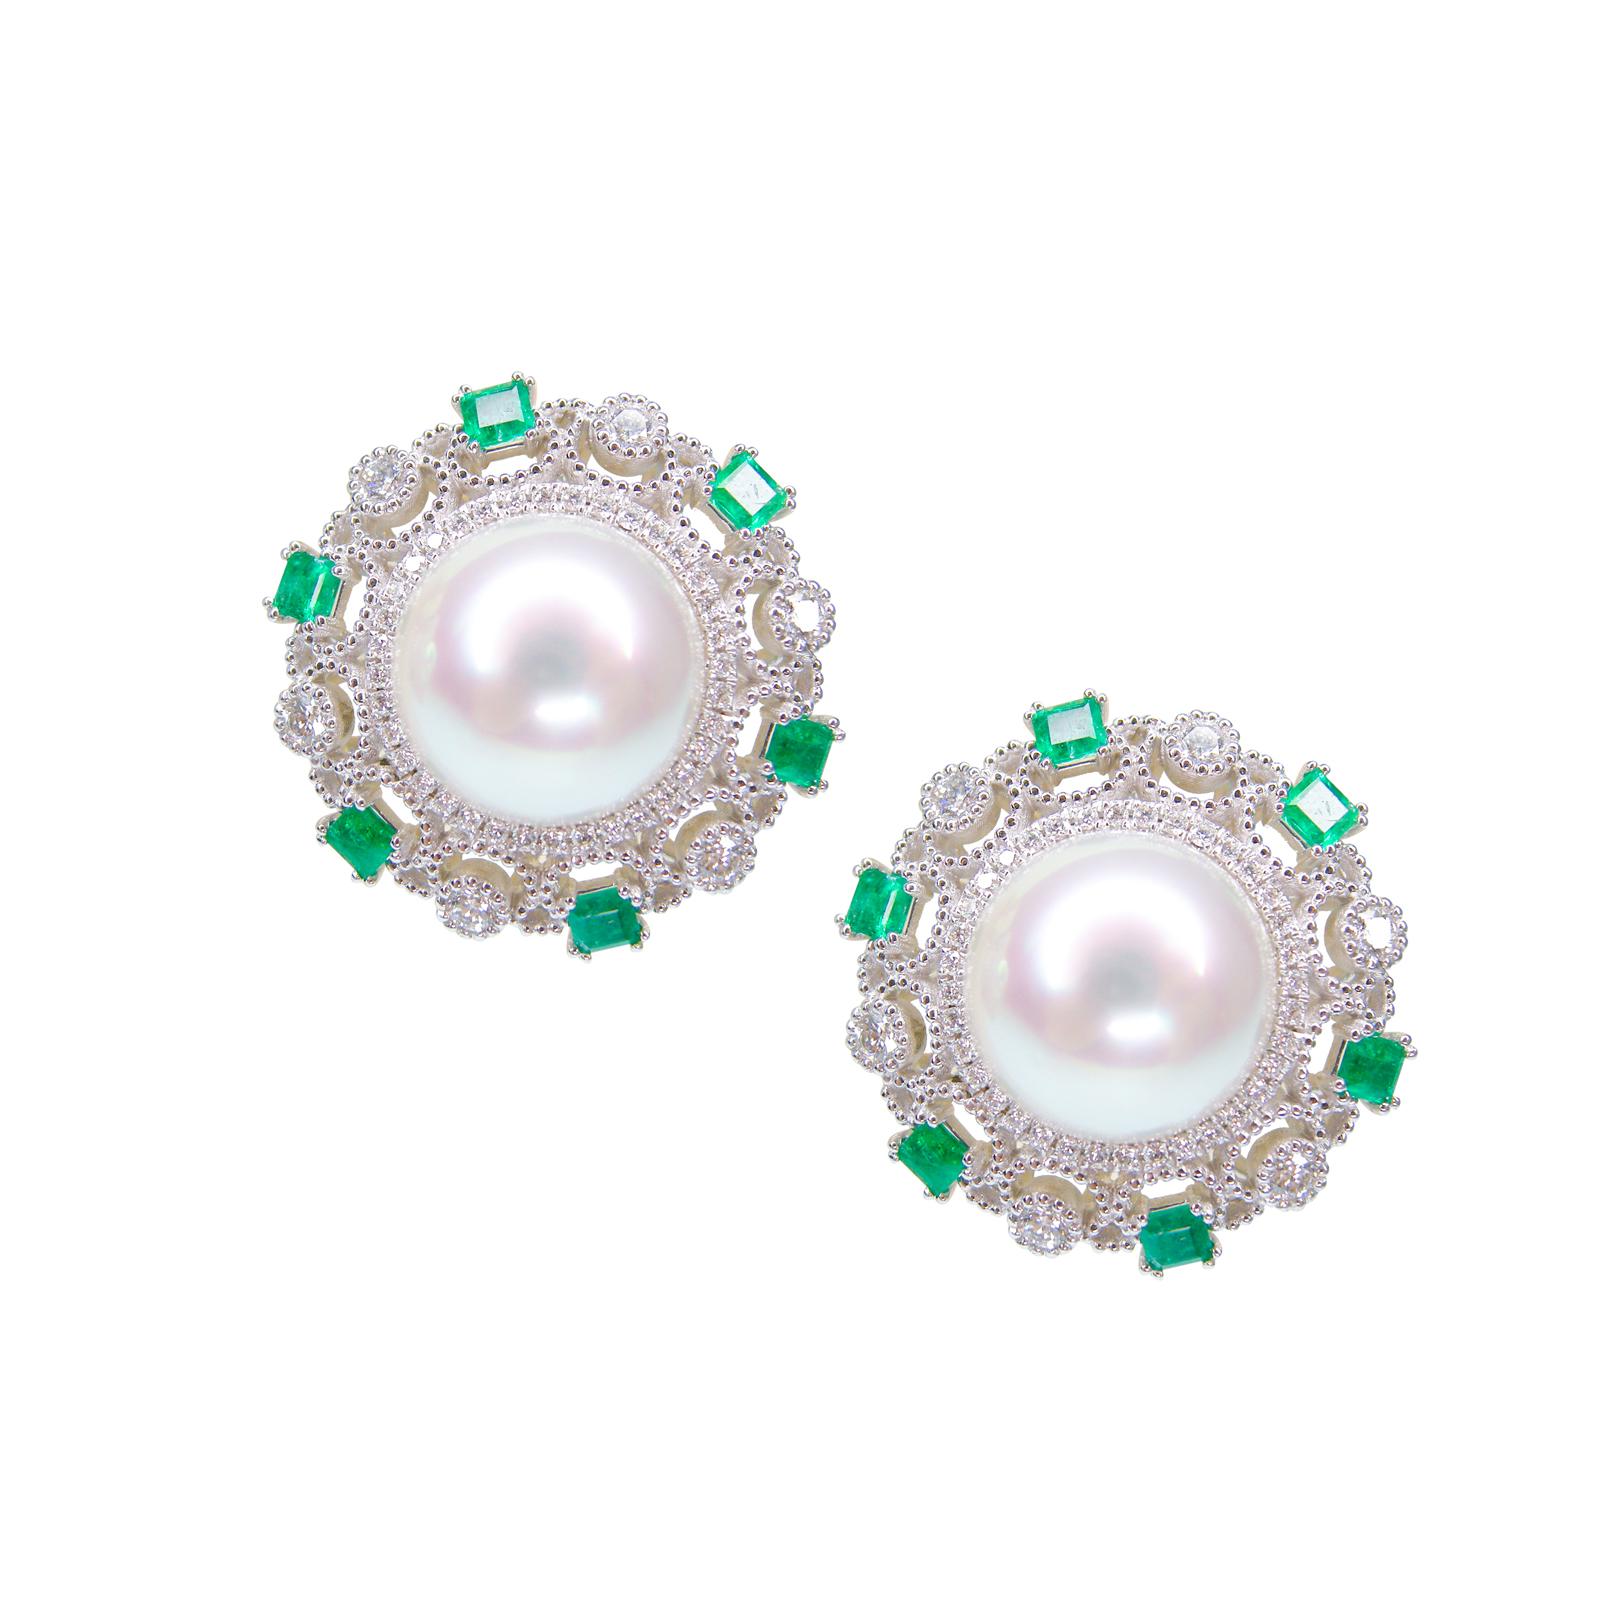 EMERALD, DIAMOND & PEARL EARRINGS BESPOKE FINE JEWELLERY BY SHAHINA HATTA